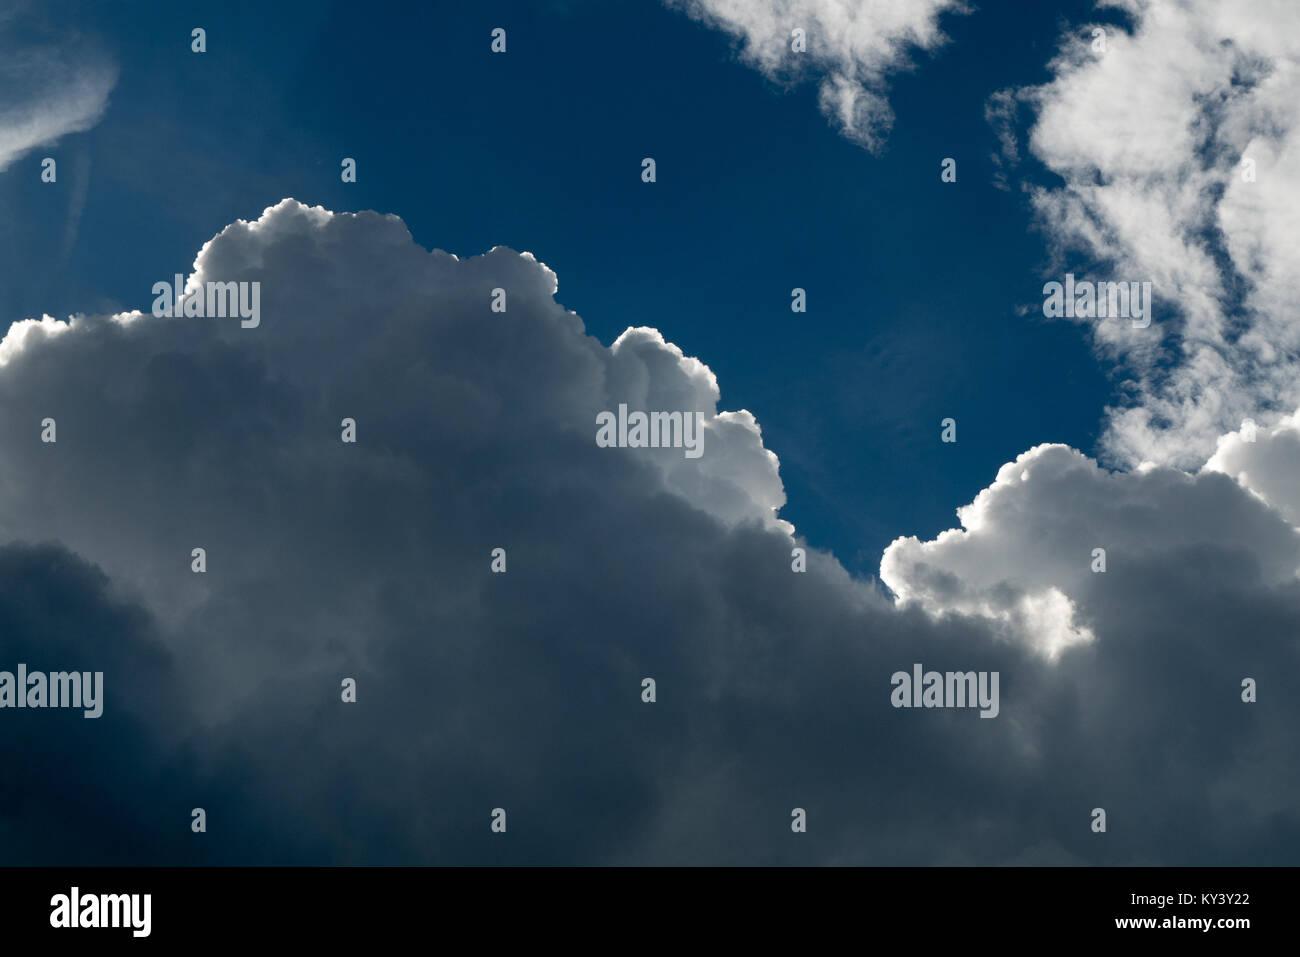 white cumulonimbus on blue sky, dark side of a cloud - Stock Image